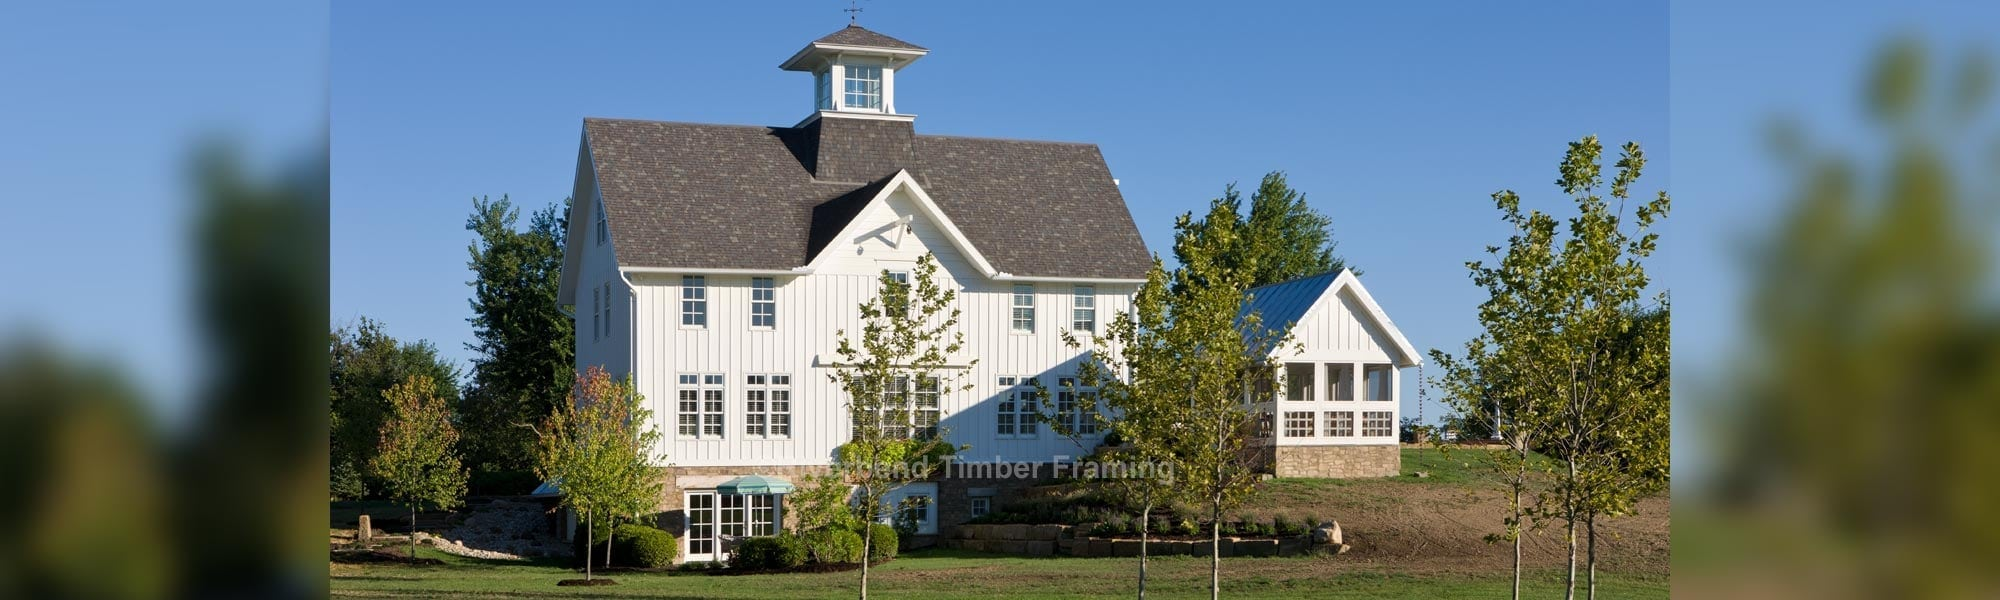 barn style home timber framed